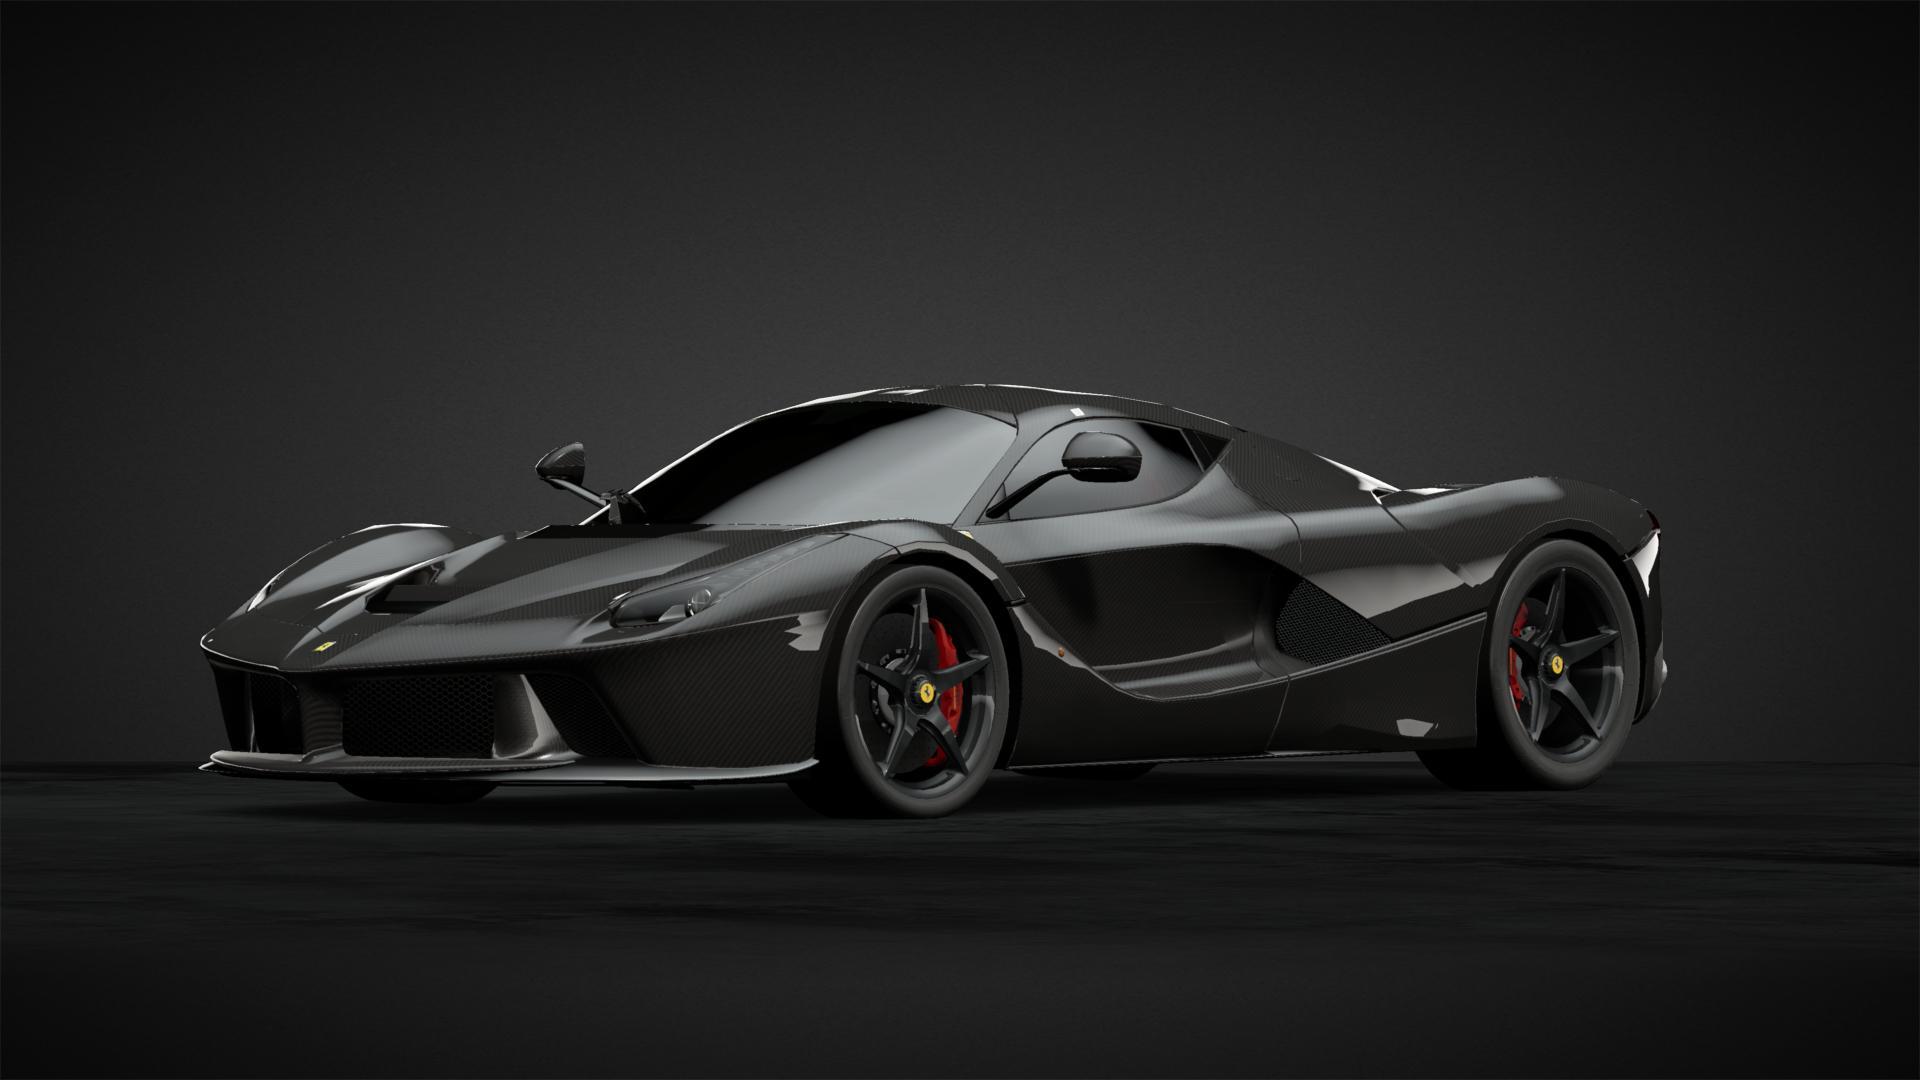 Carbon Fibre La Ferrari Car Livery By Grenshaw Community Gran Turismo Sport